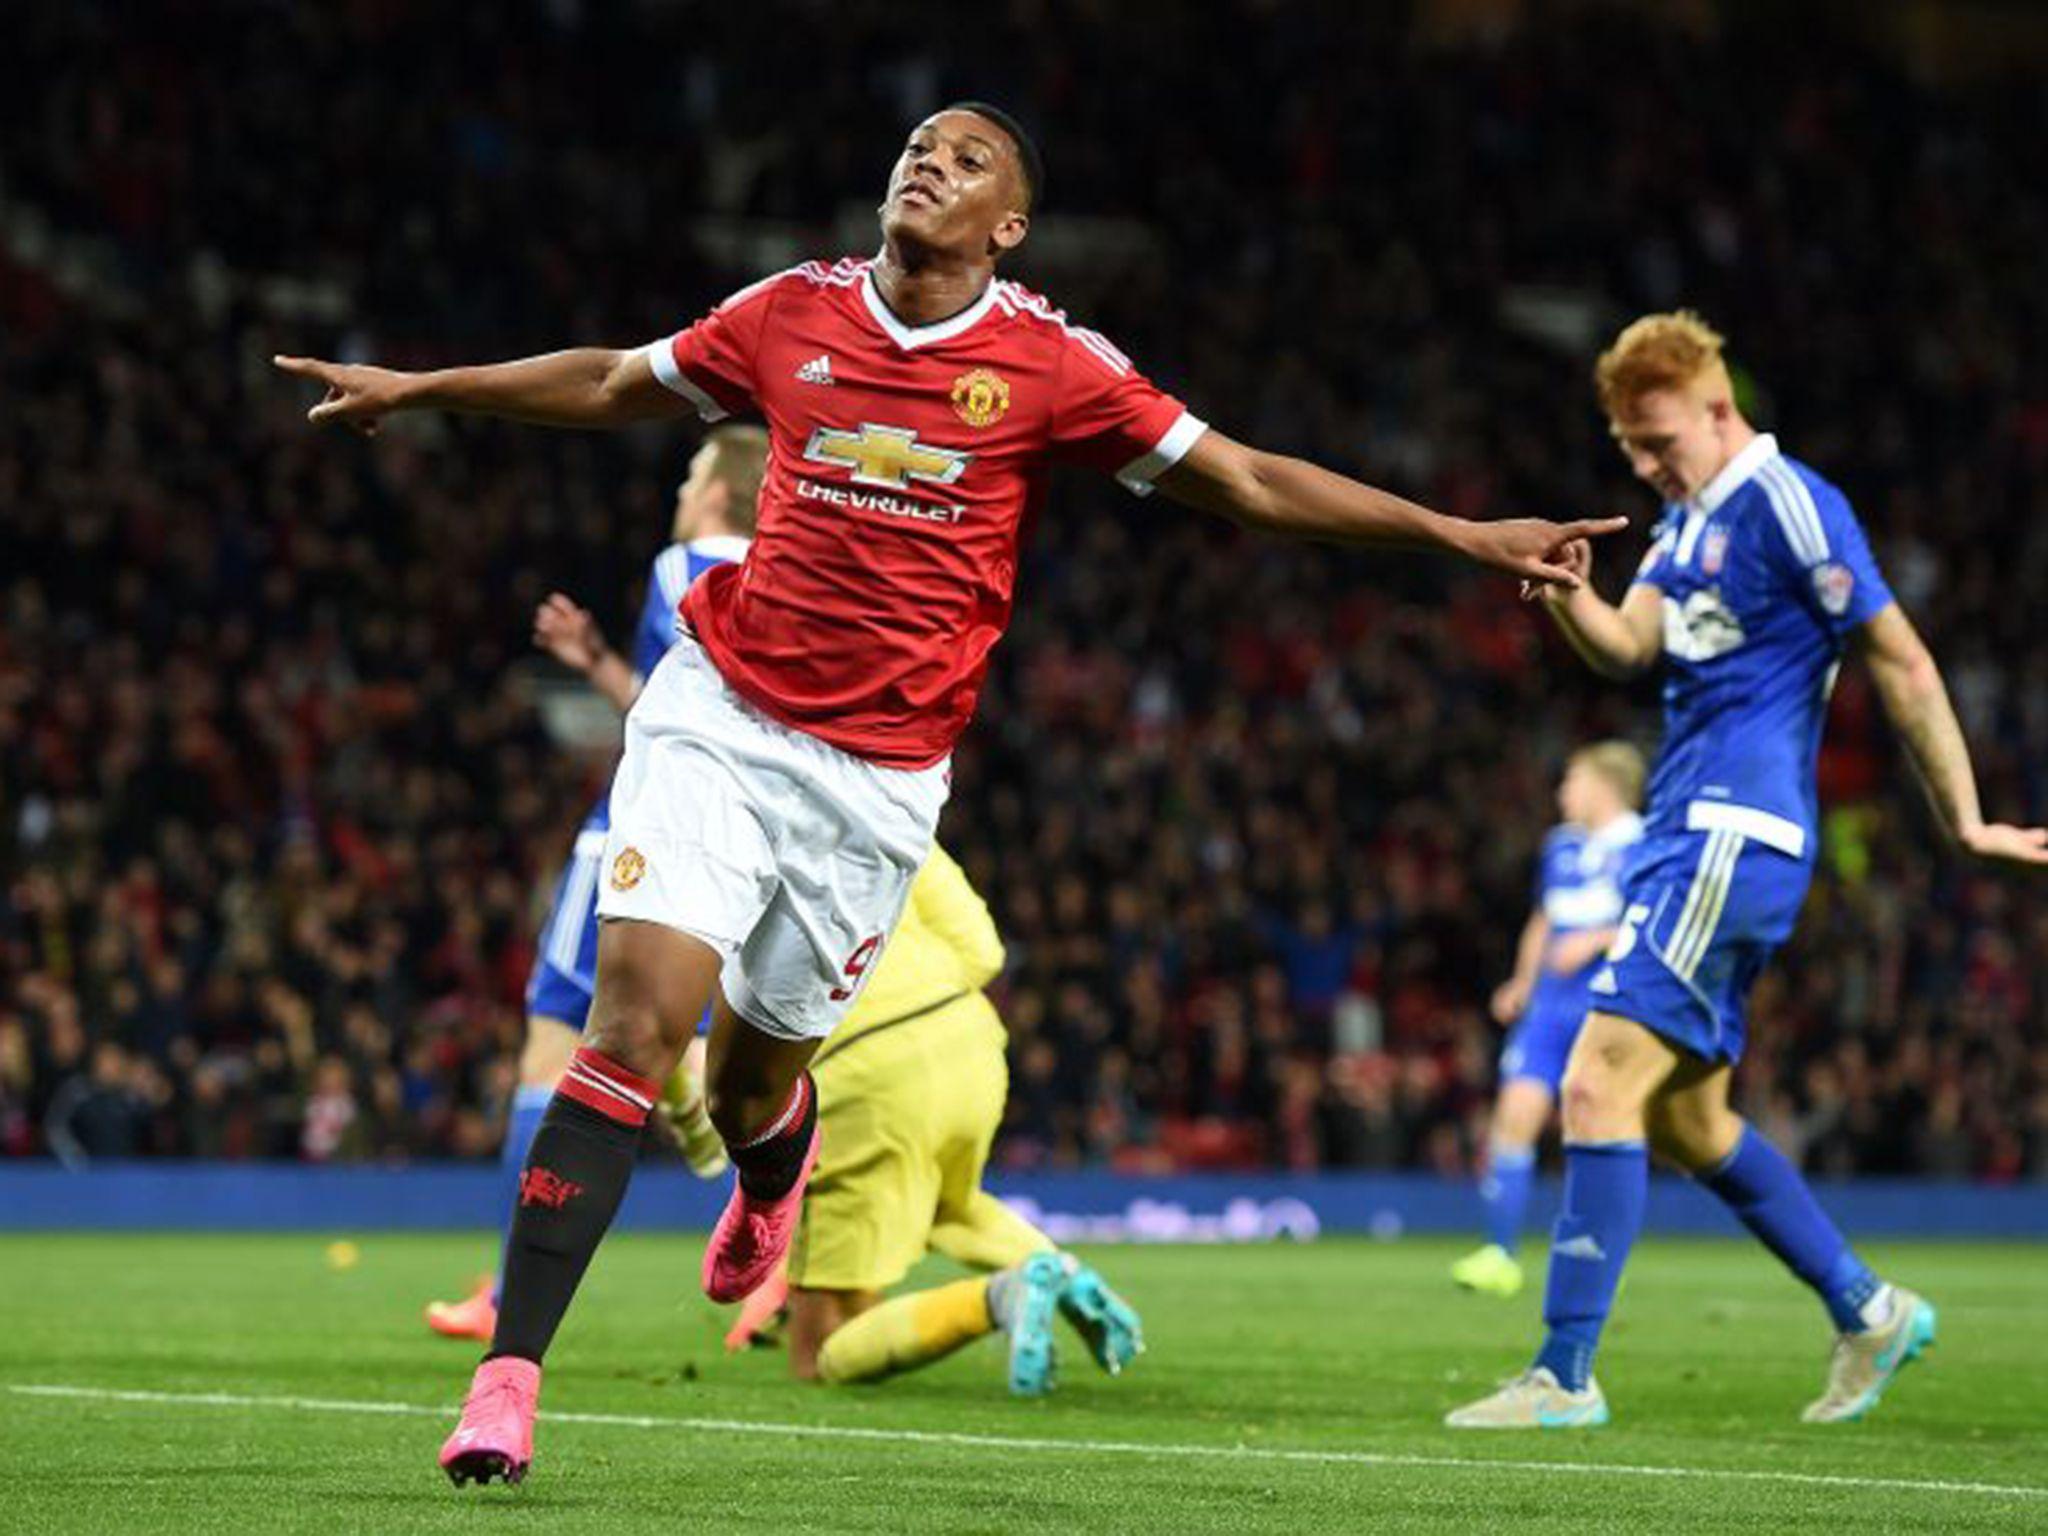 Man Utd Vs Ipswich Martial Scores Again Man Ipswich Martial